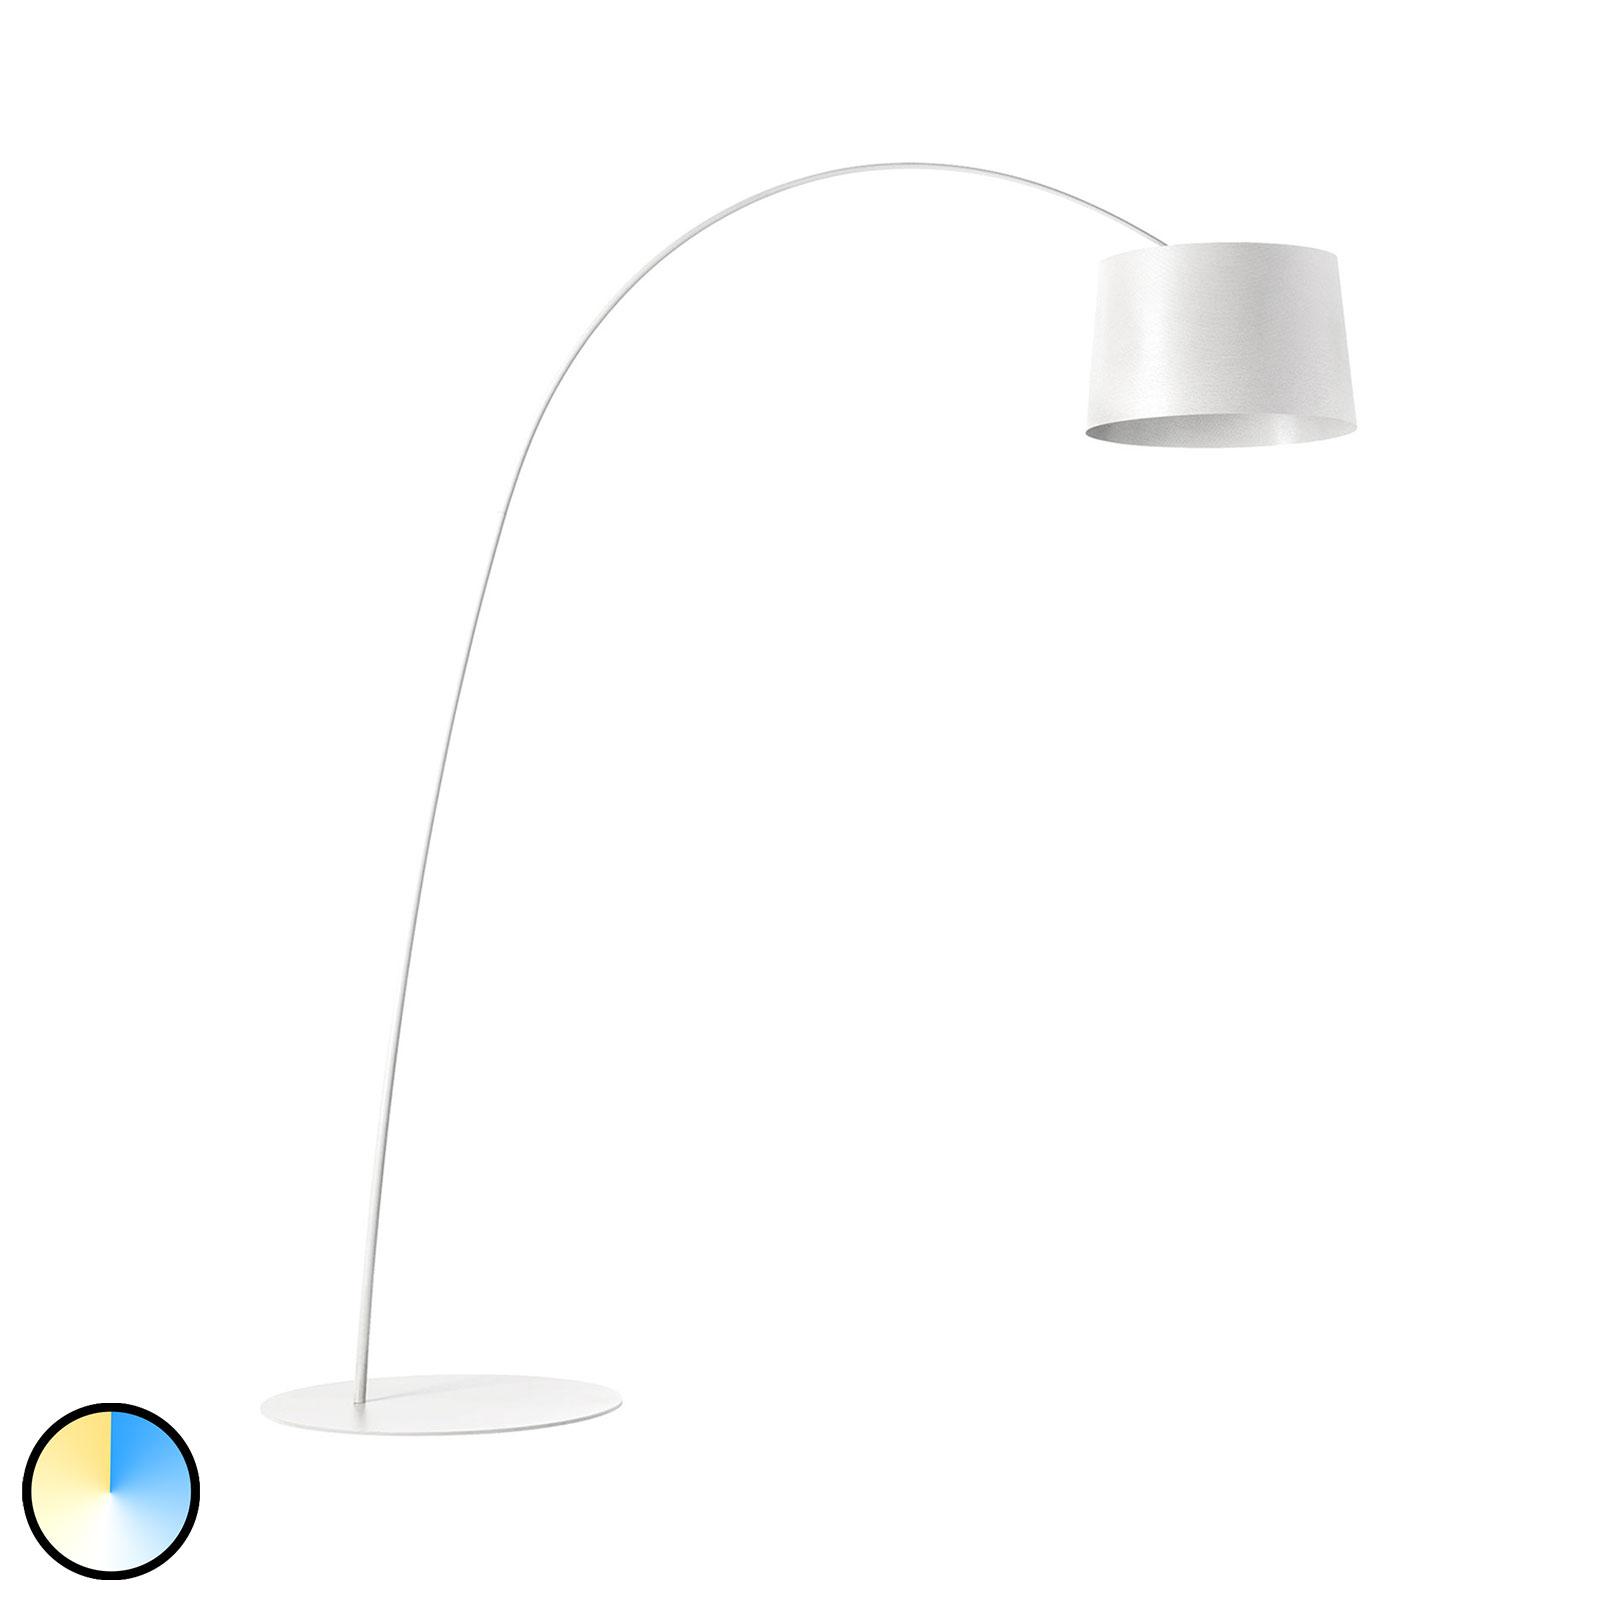 Foscarini MyLight Twiggy lampe arquée LED, blanche